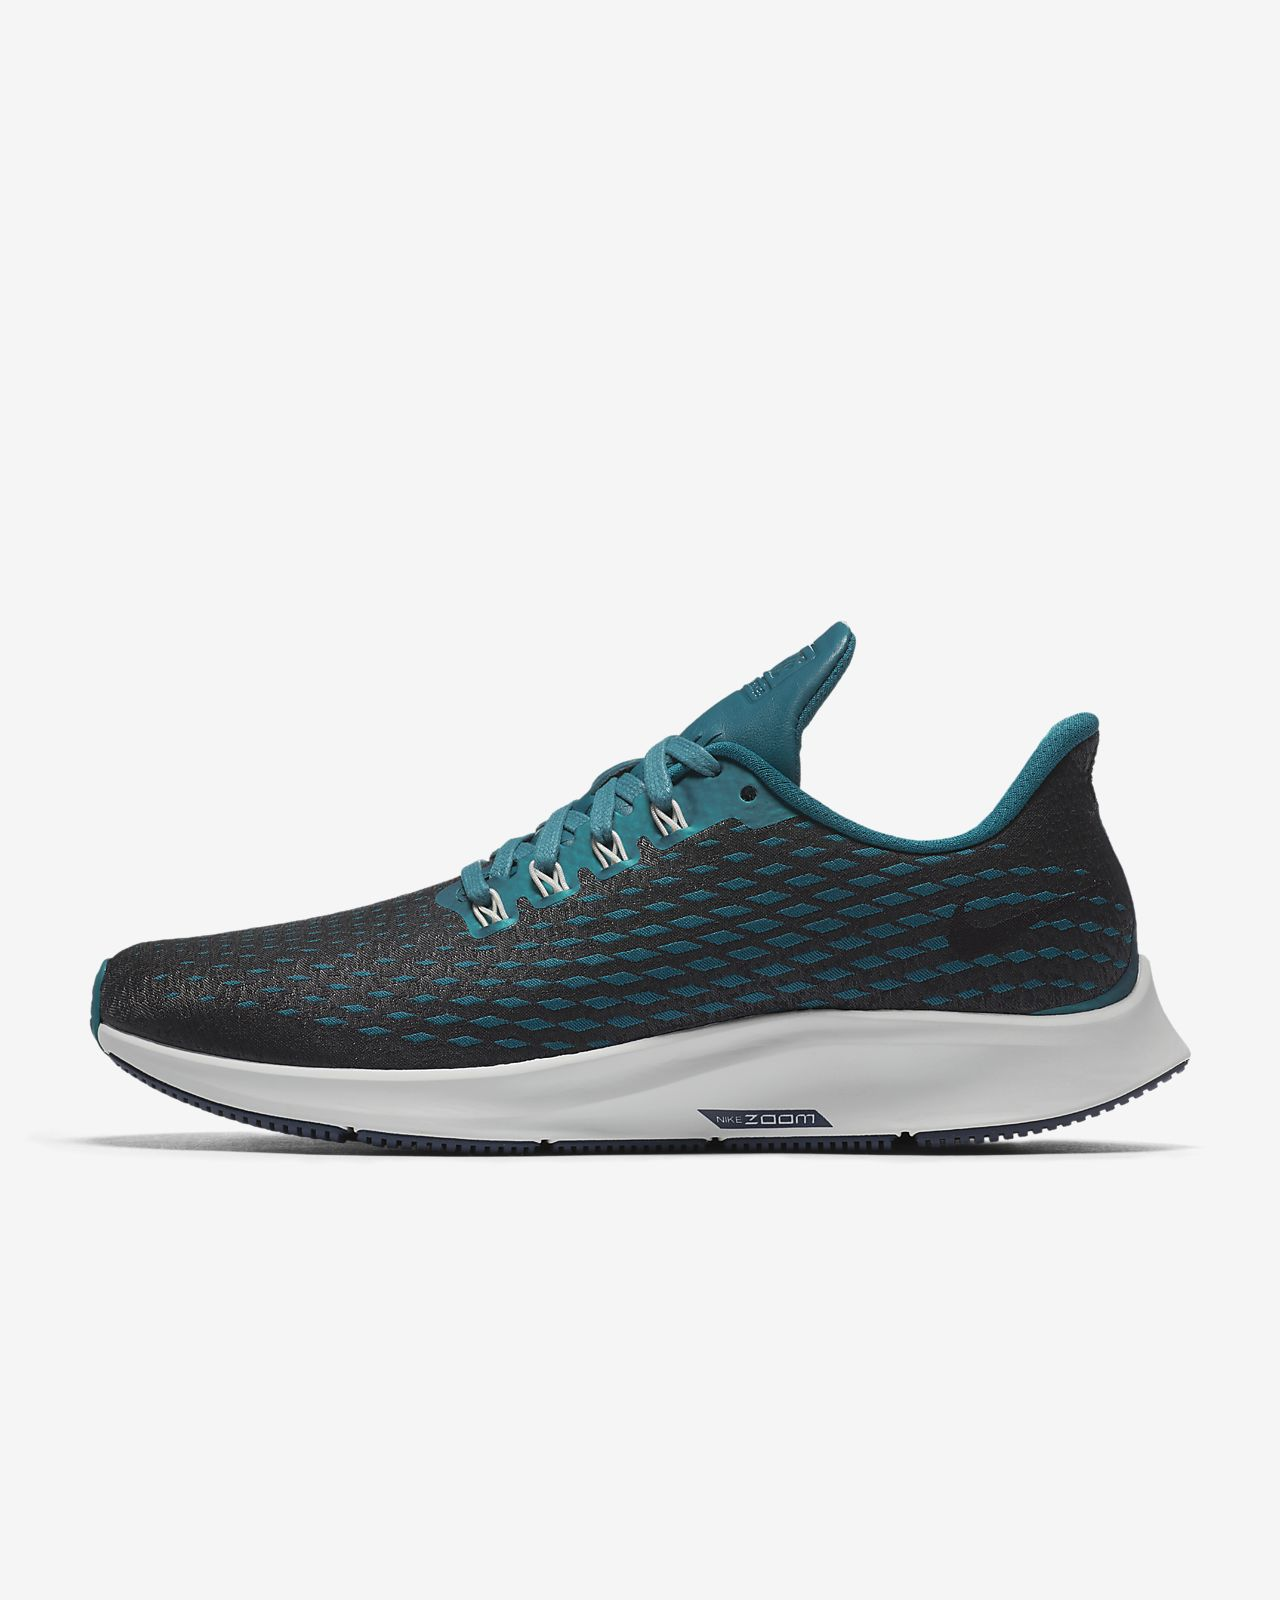 Chaussure de running Nike Air Zoom Pegasus 35 Premium pour Femme